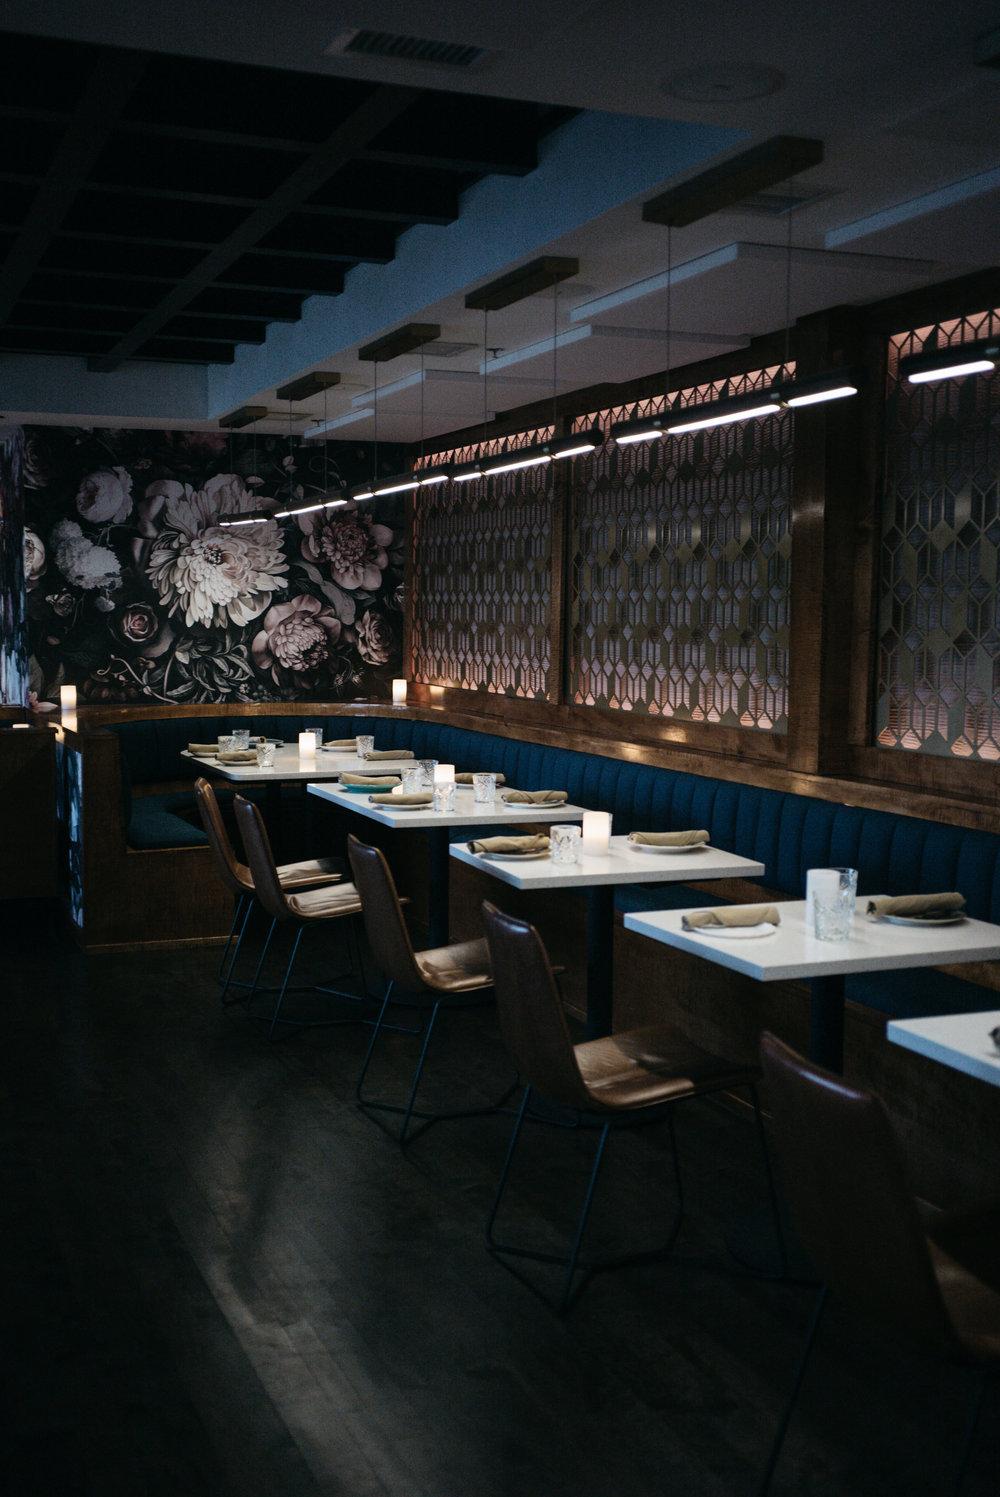 12th-Table-WEDDING-RENTALS-NASHVILLE-Design-Tips-Stock-Photos-Mockingbird-Nashville24.jpg